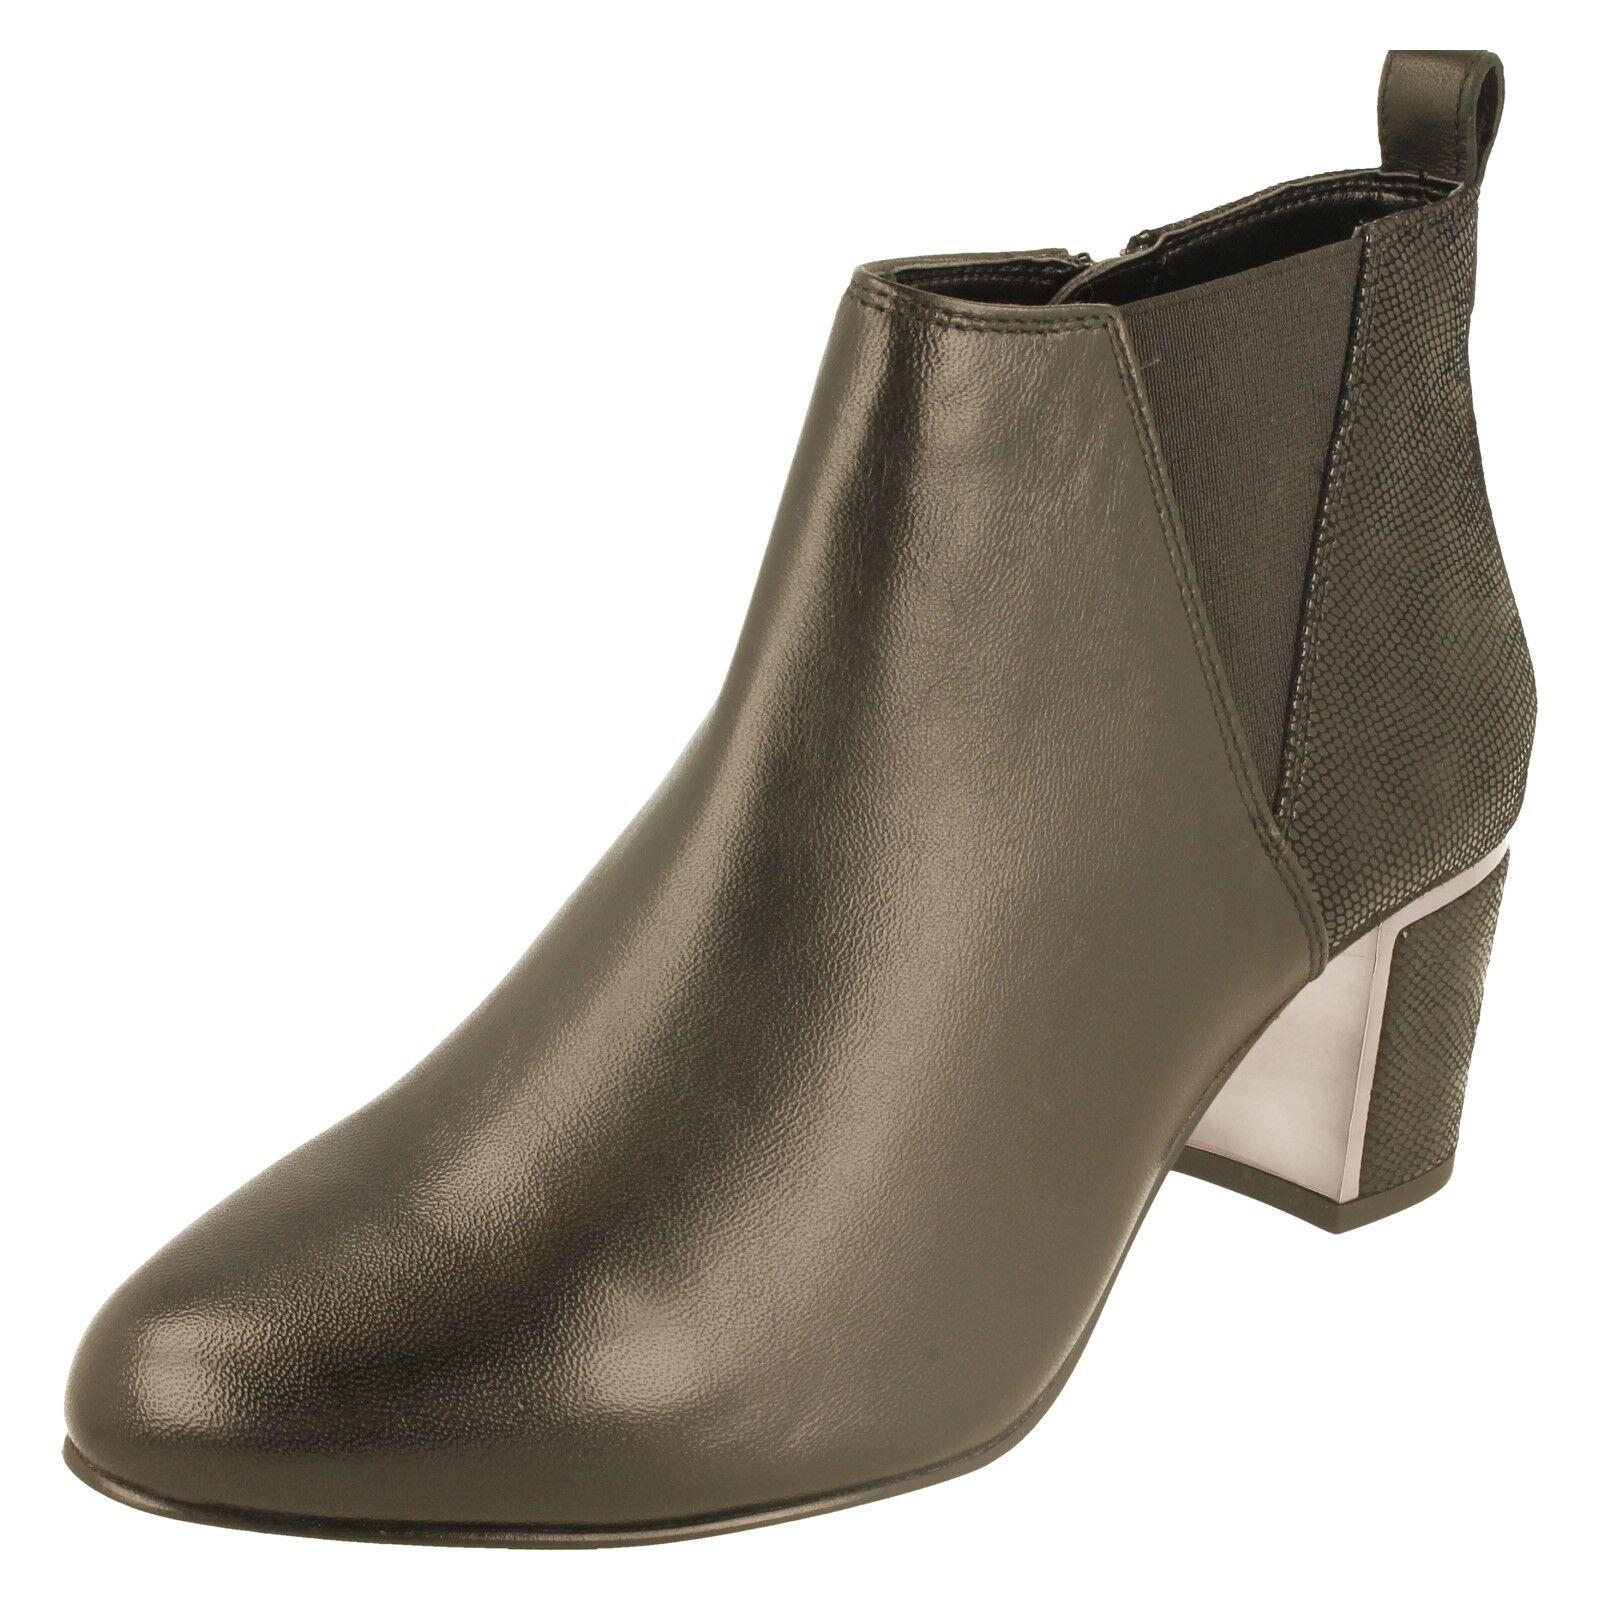 Ladies Van Dal Ankle Boots - Tangier